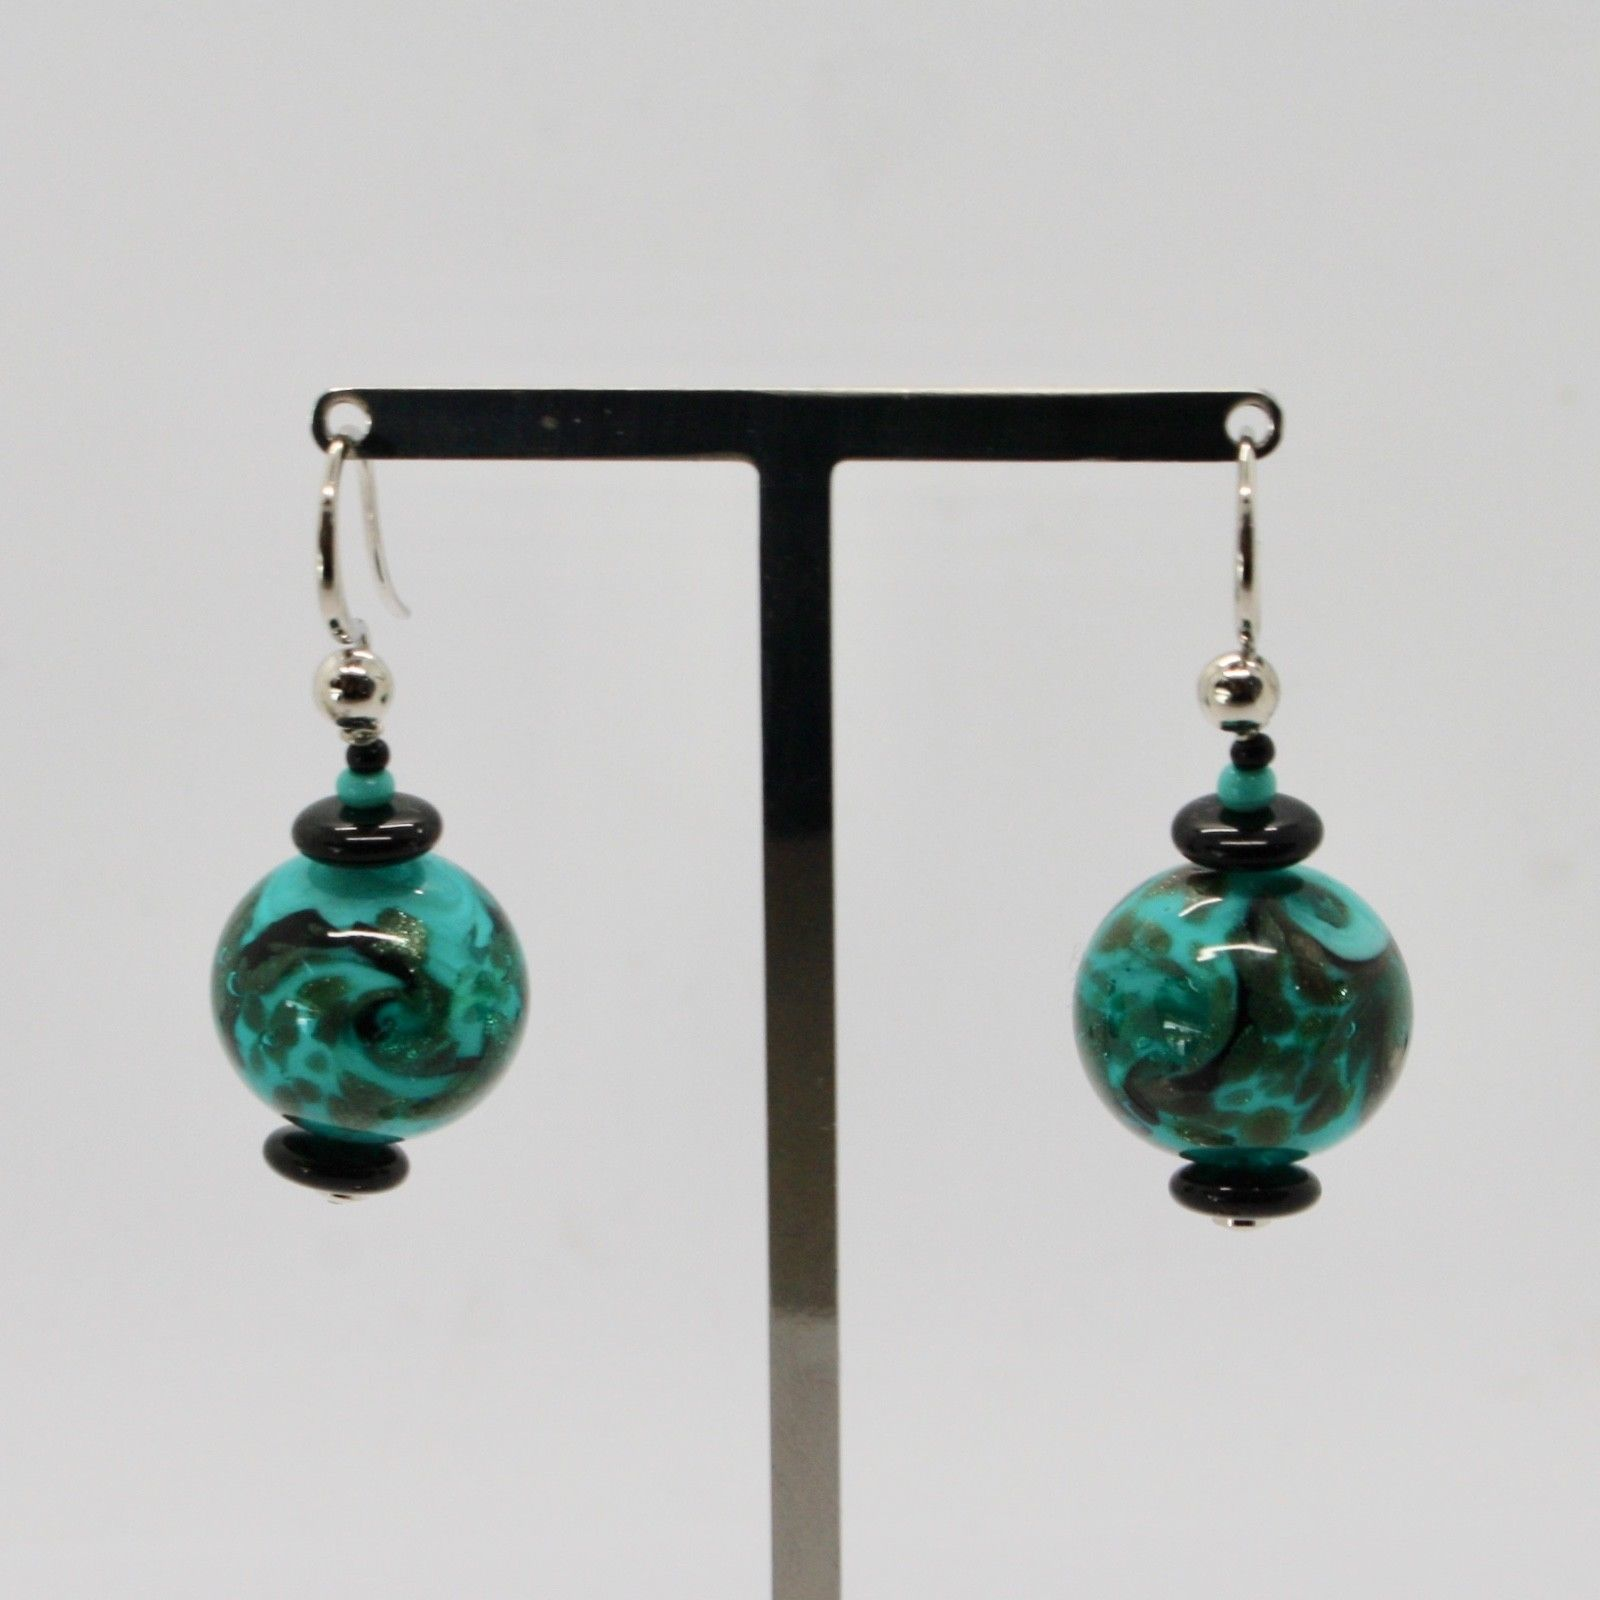 EARRINGS ANTICA MURRINA VENEZIA WITH MURANO GLASS BLACK SILVER GREEN OR592A59